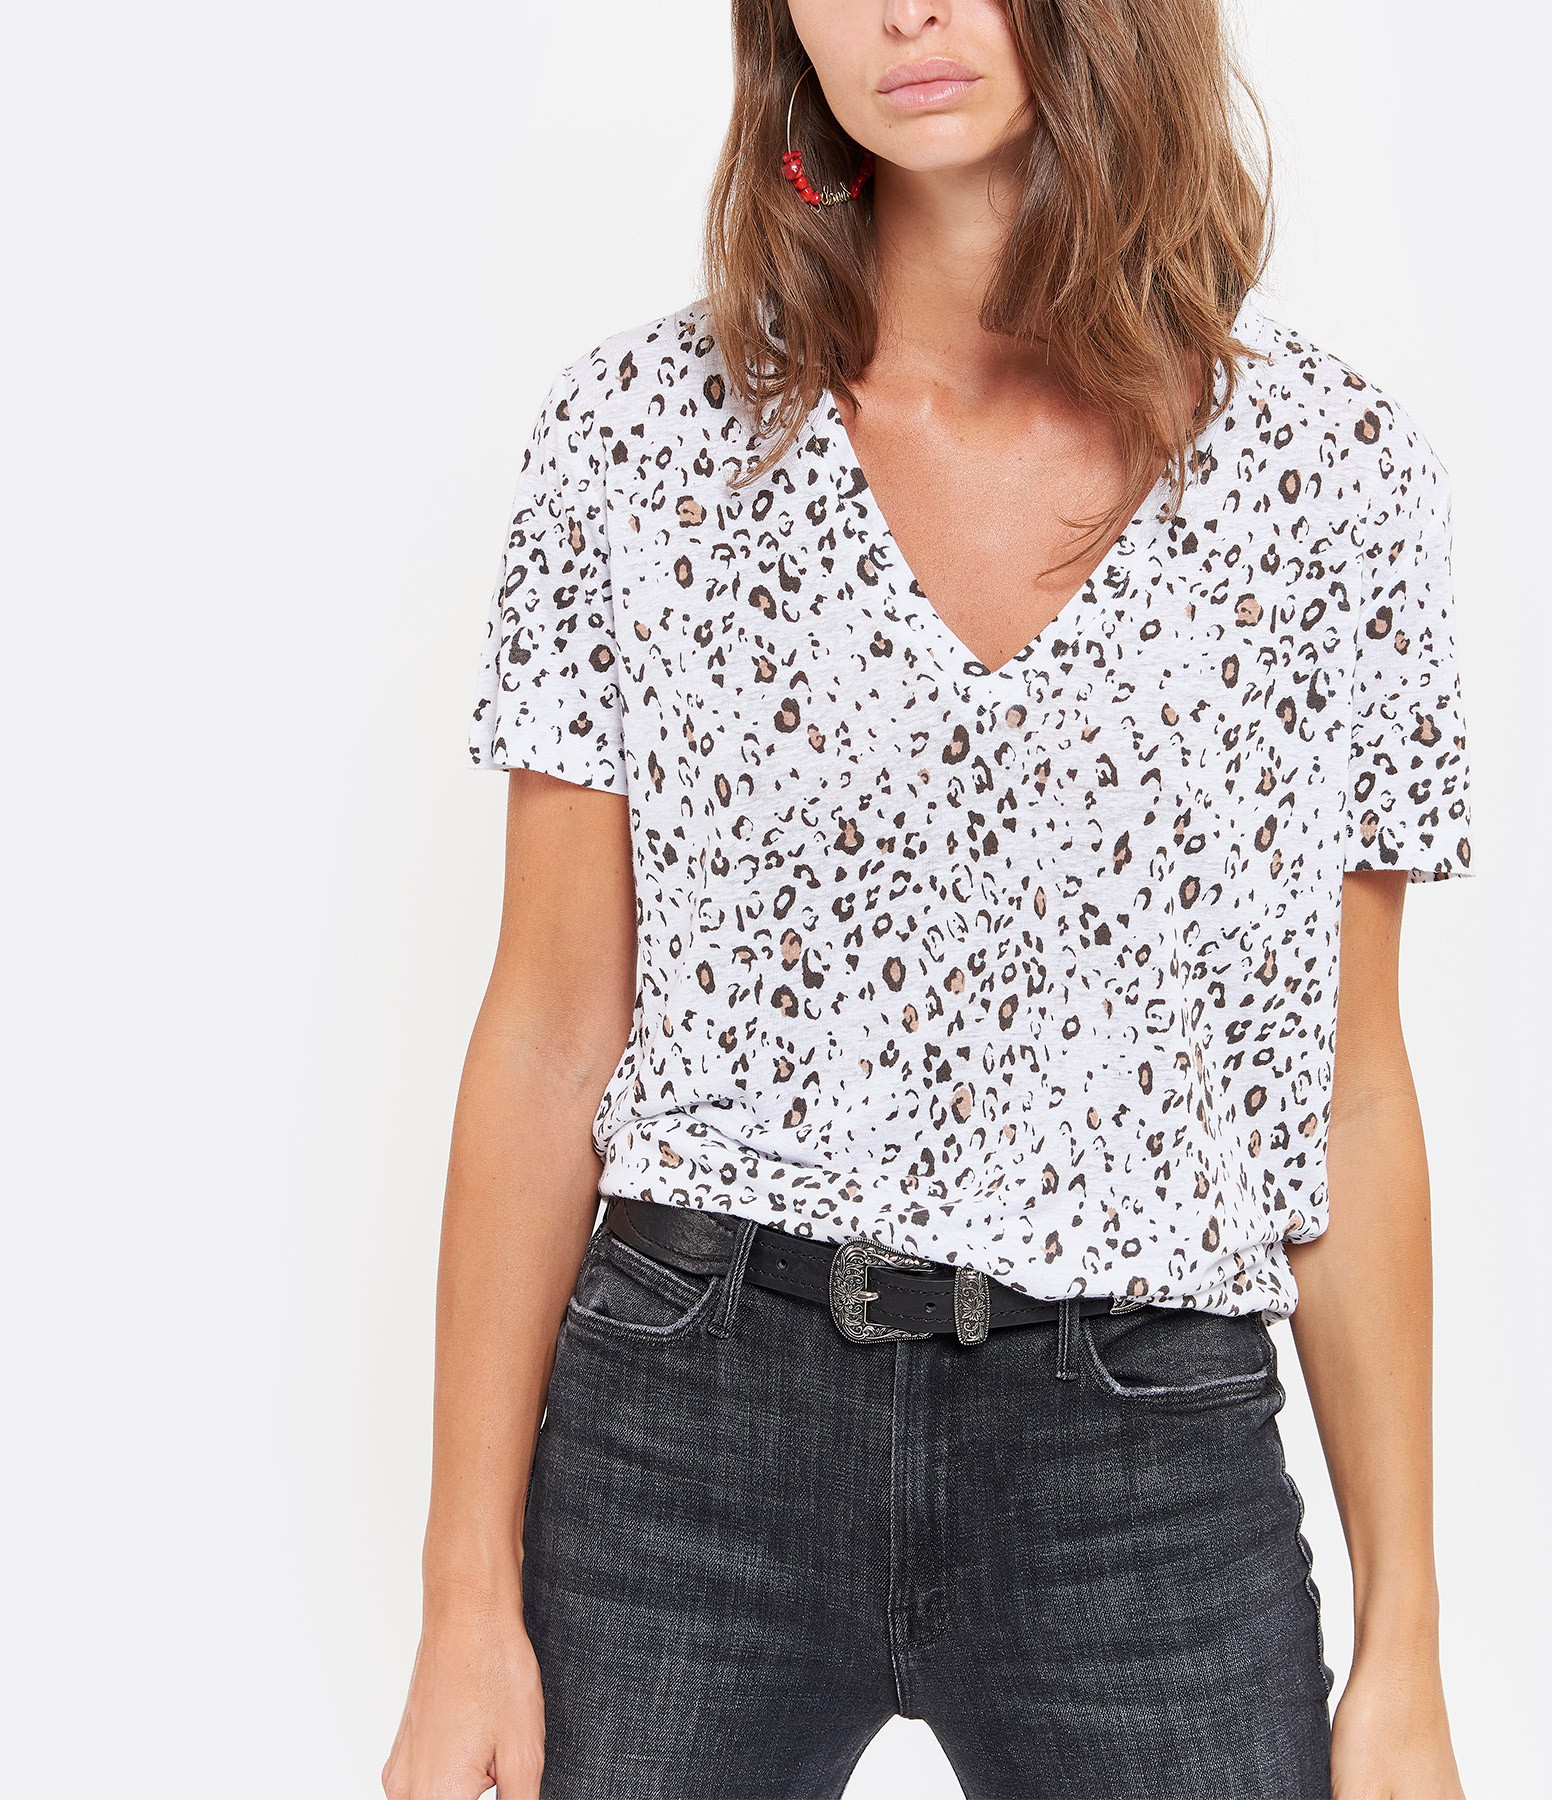 RAILS - Tee-shirt Cara Lin Imprimé Léopard Lin Mocha Blanc